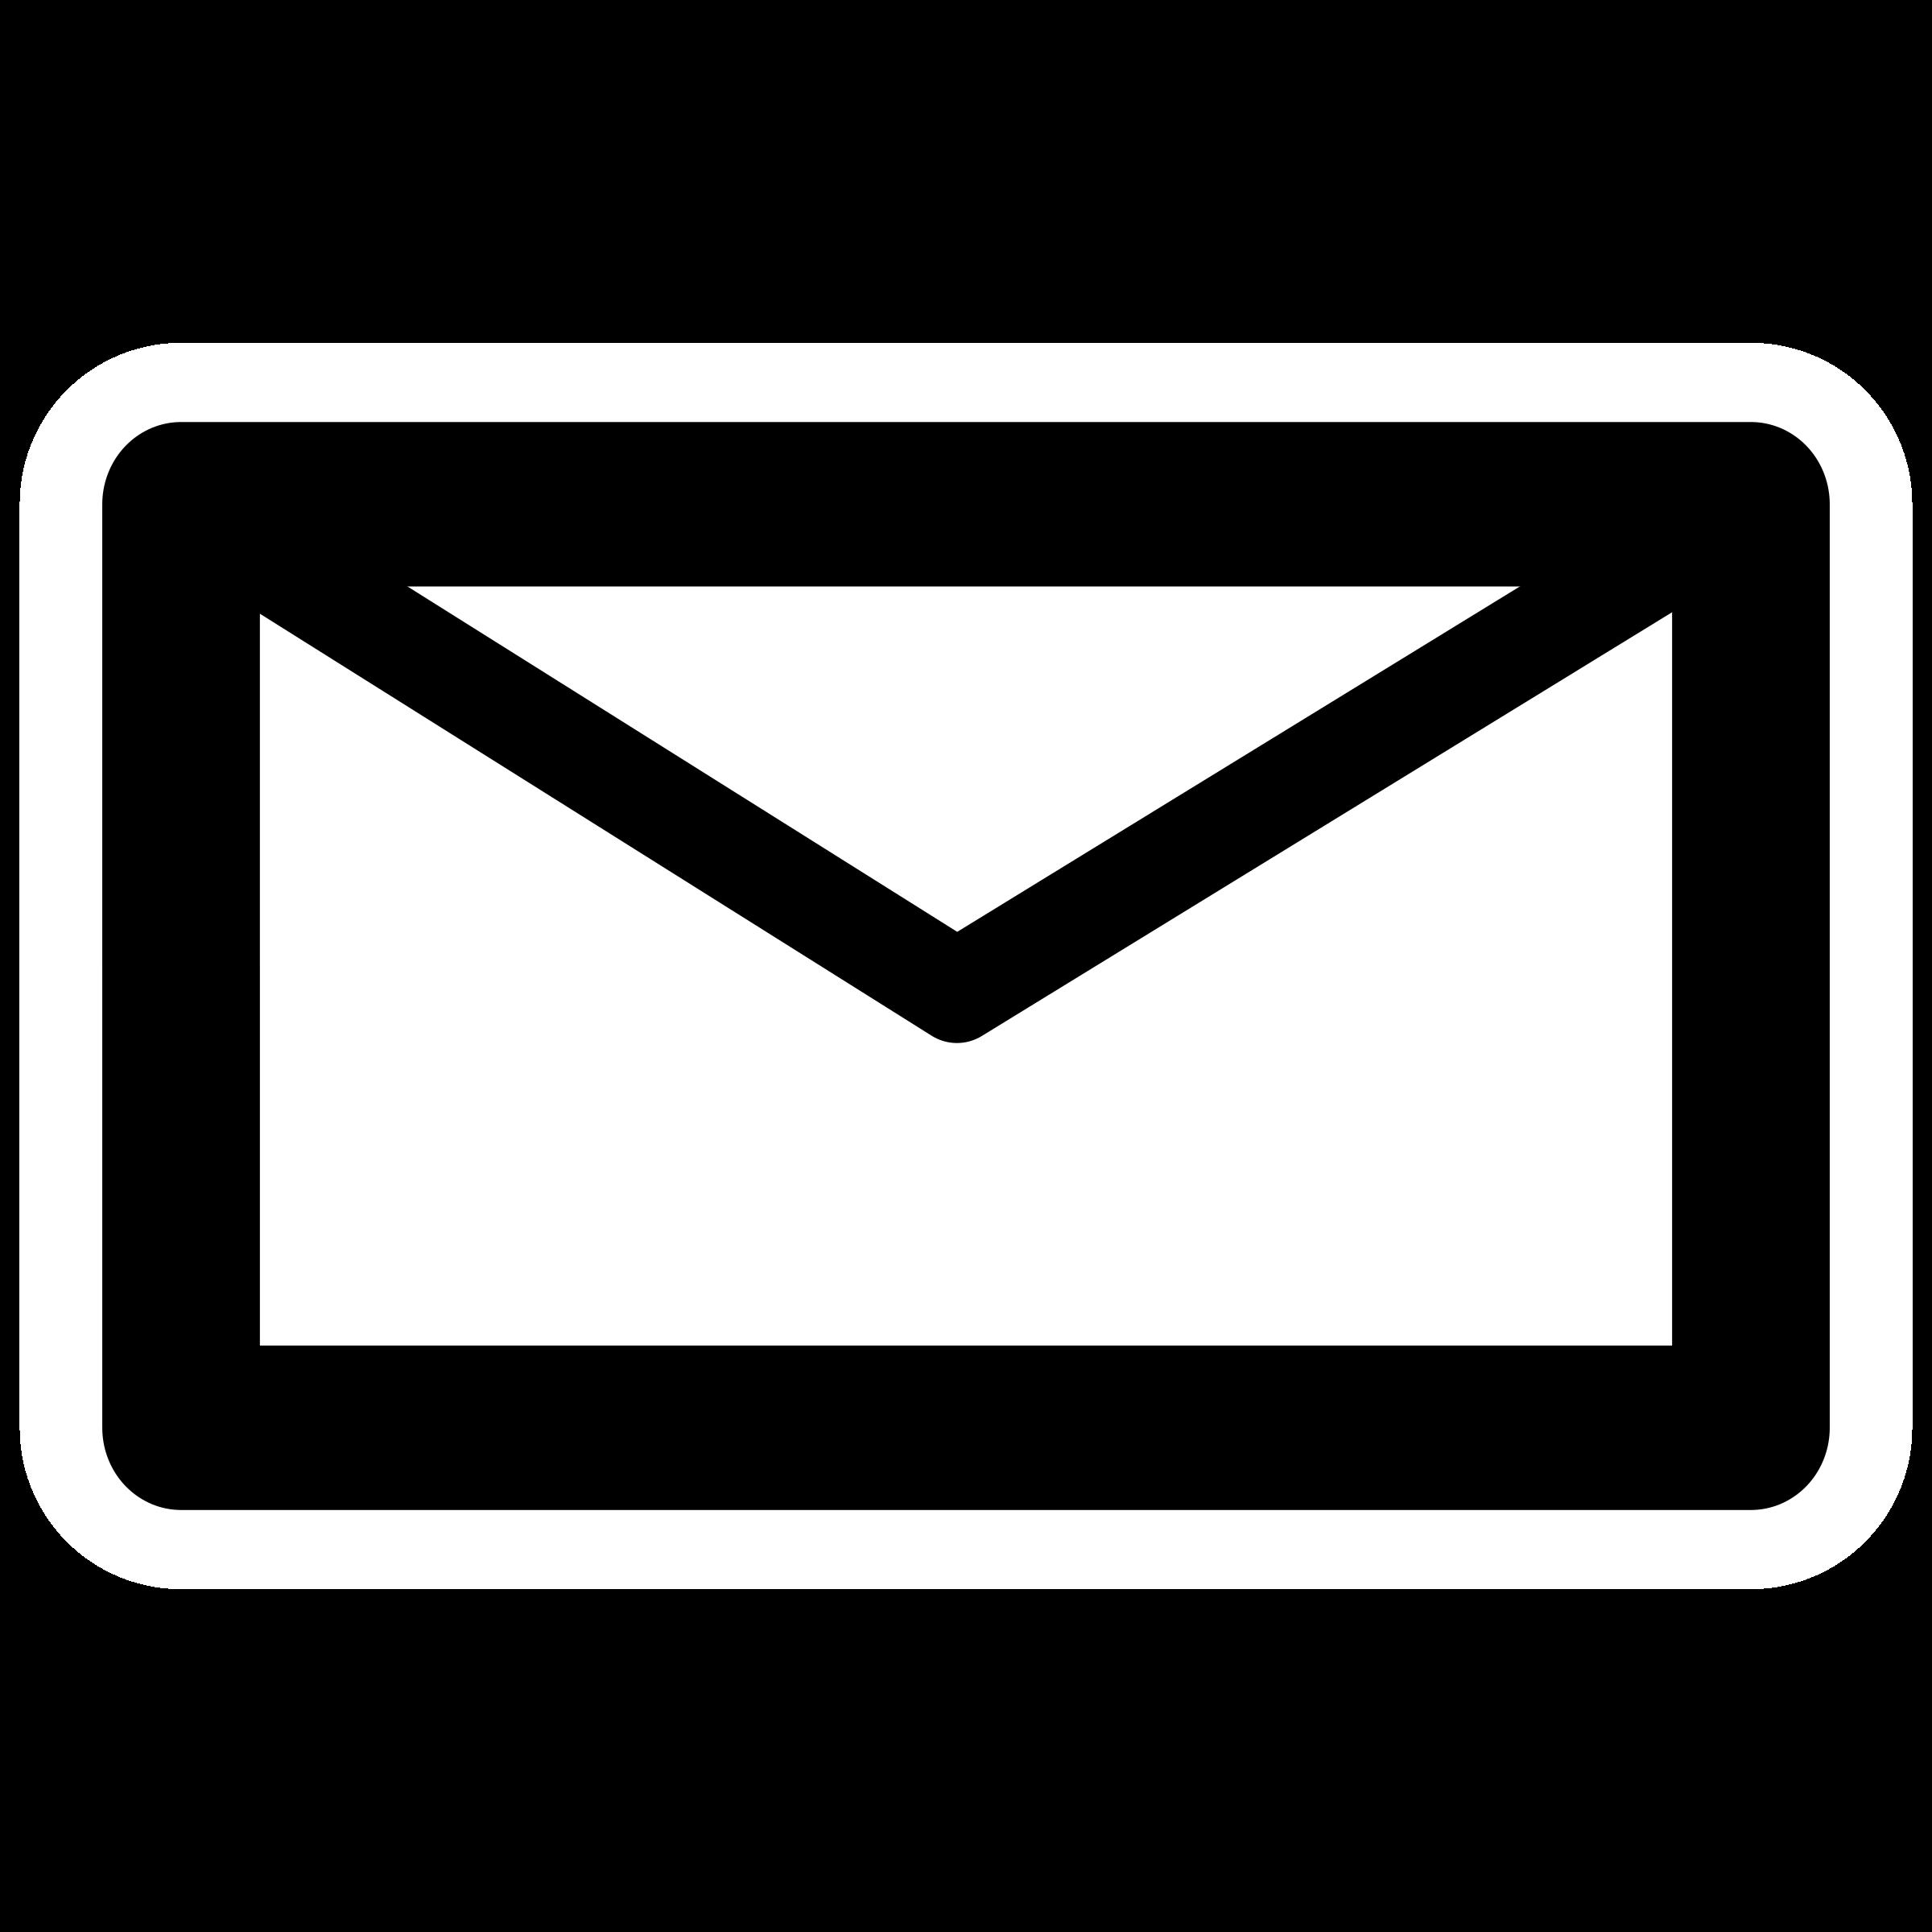 e-mail clipart-e-mail clipart-0